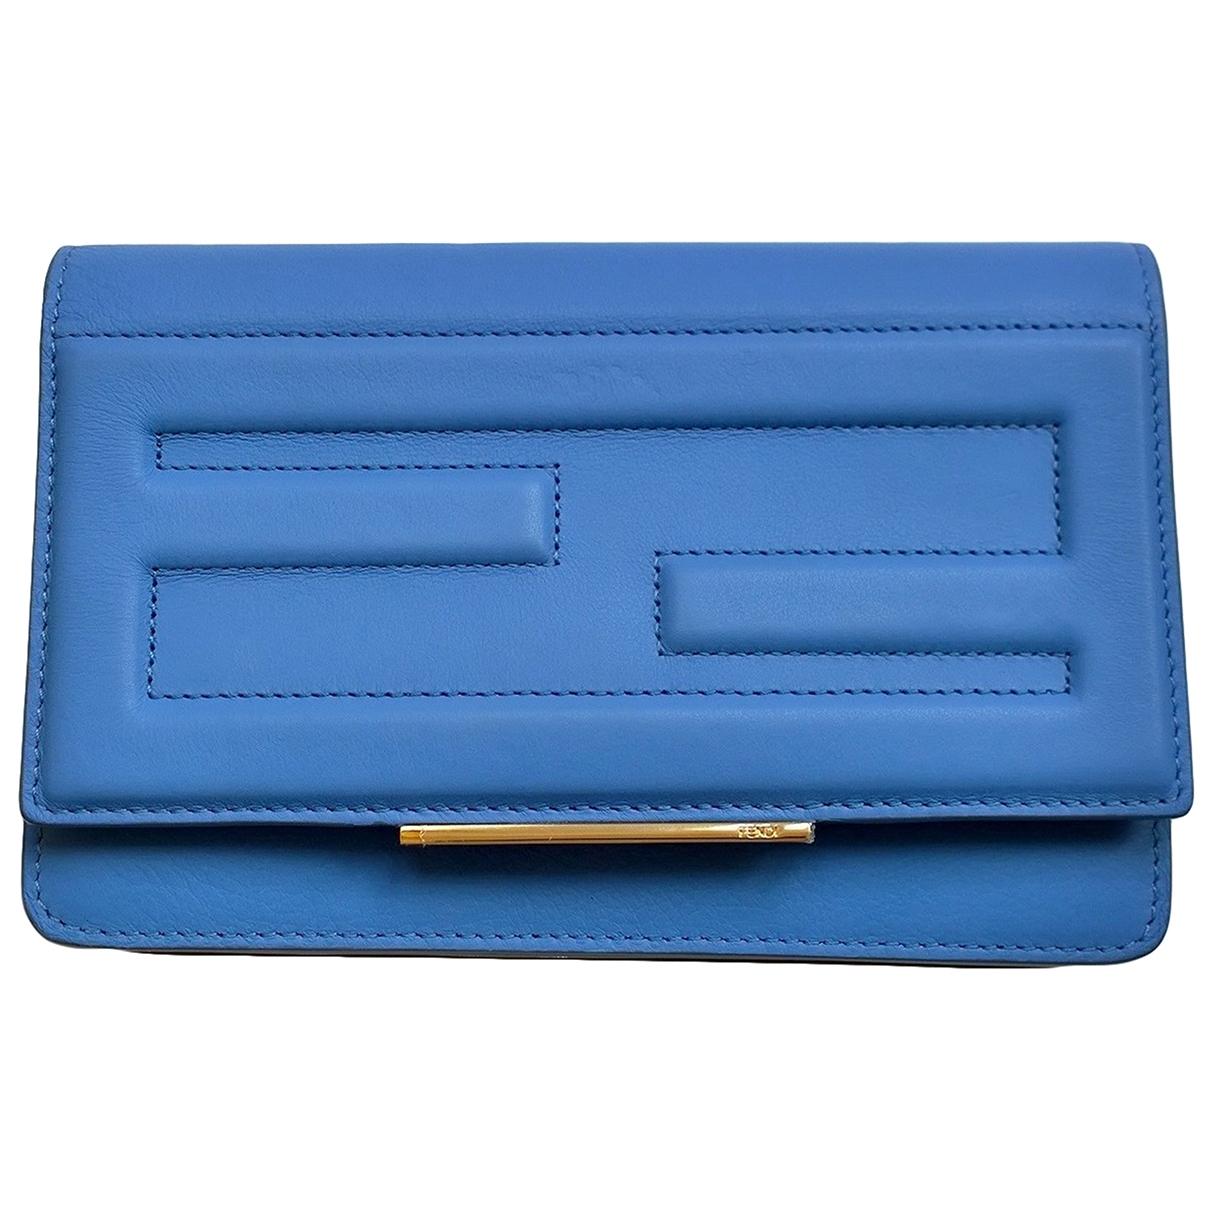 Fendi \N Clutch in  Blau Leder